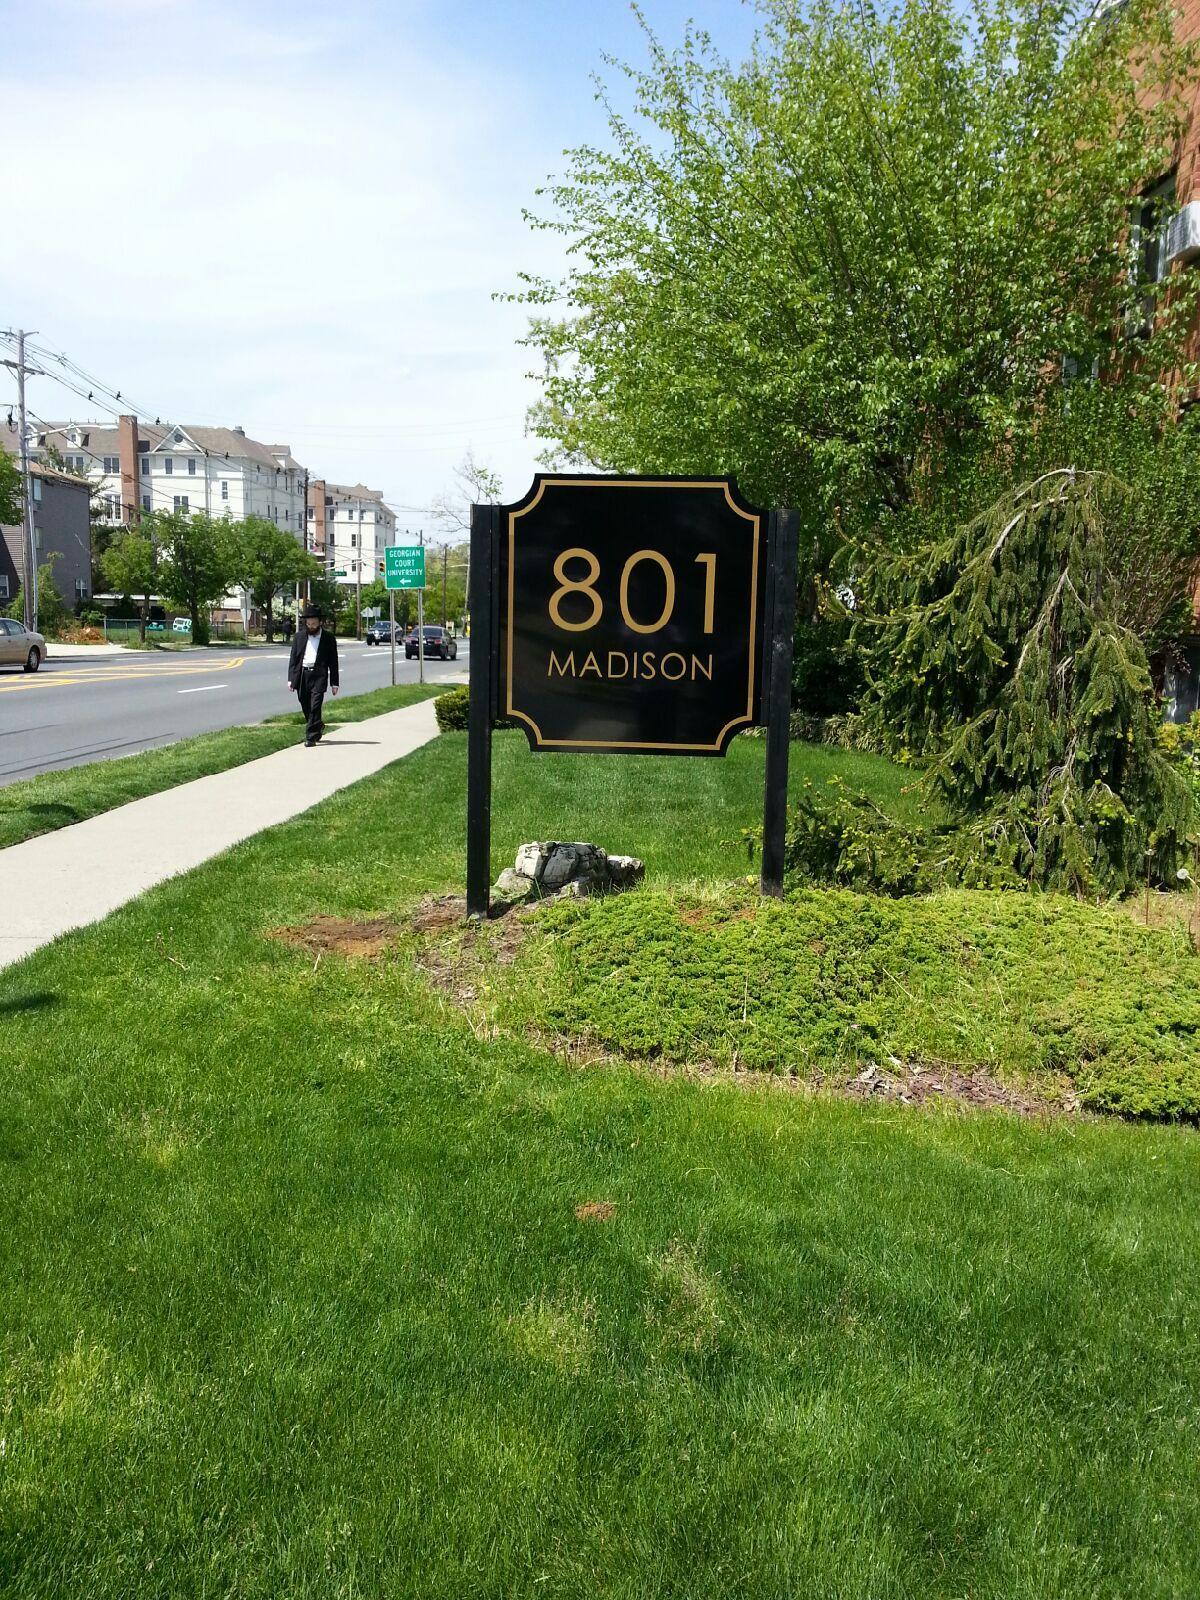 801 Madison